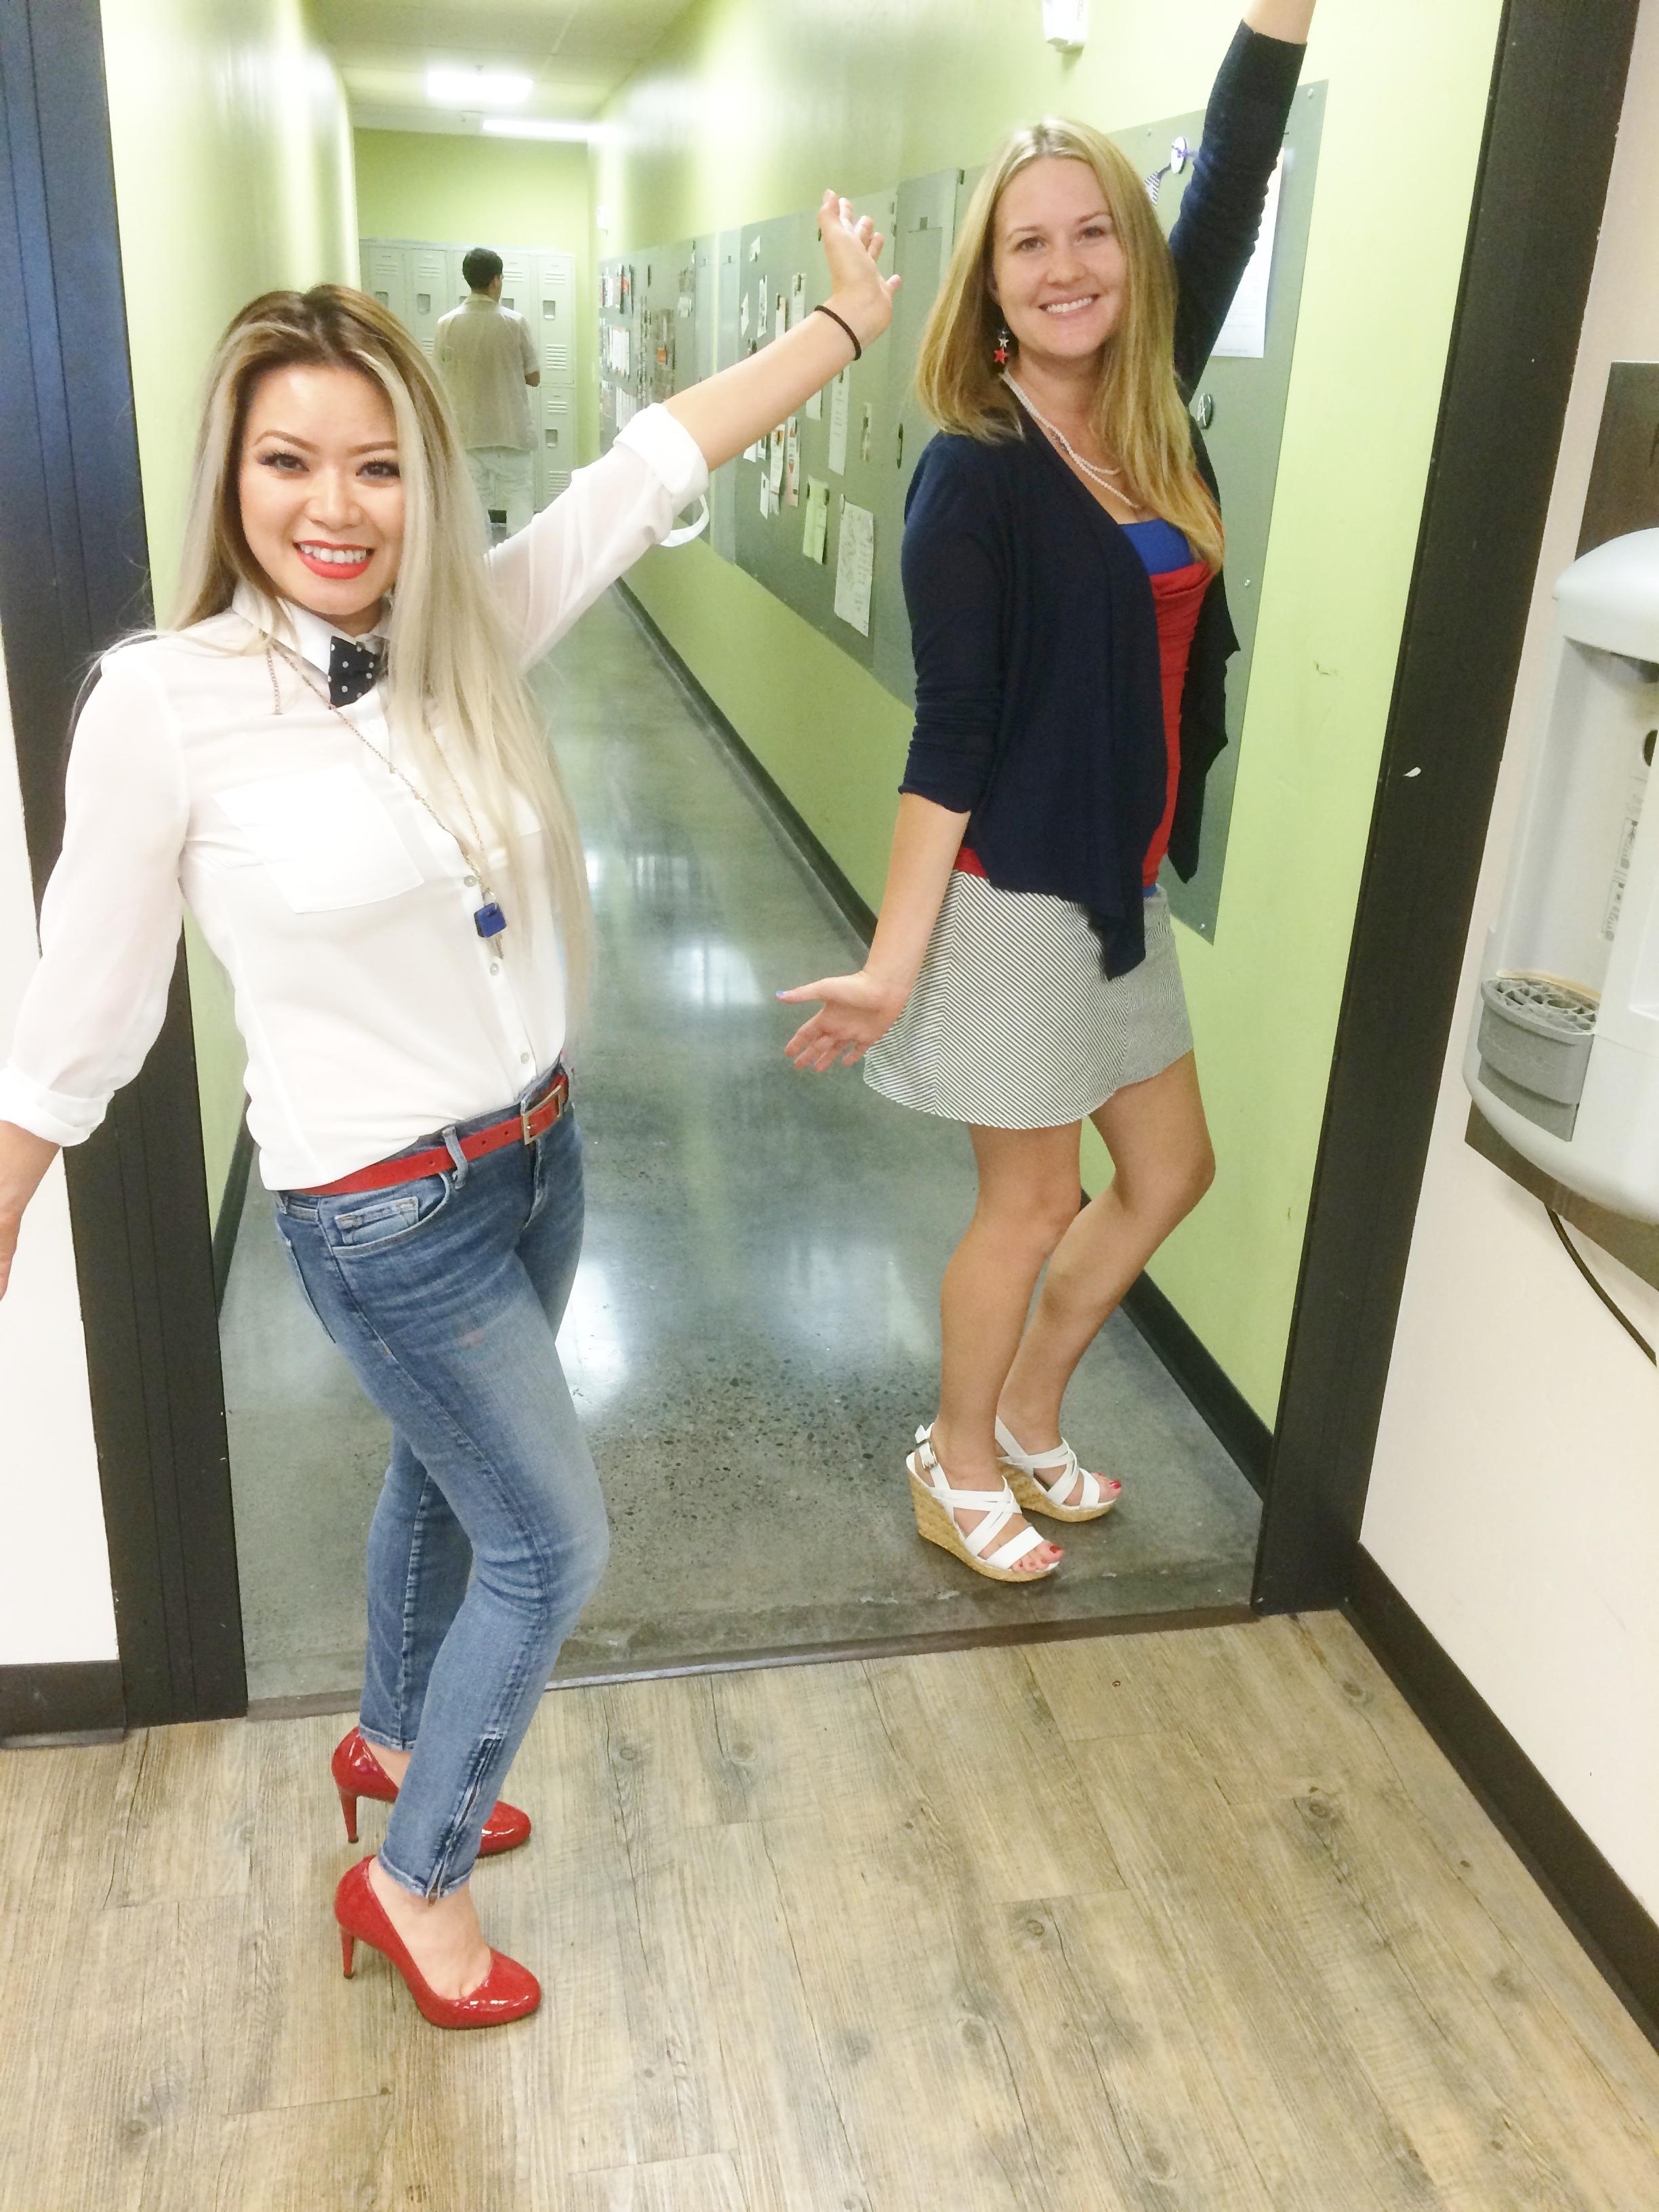 Cosmo student Van with Esti educator Ms. Kelly